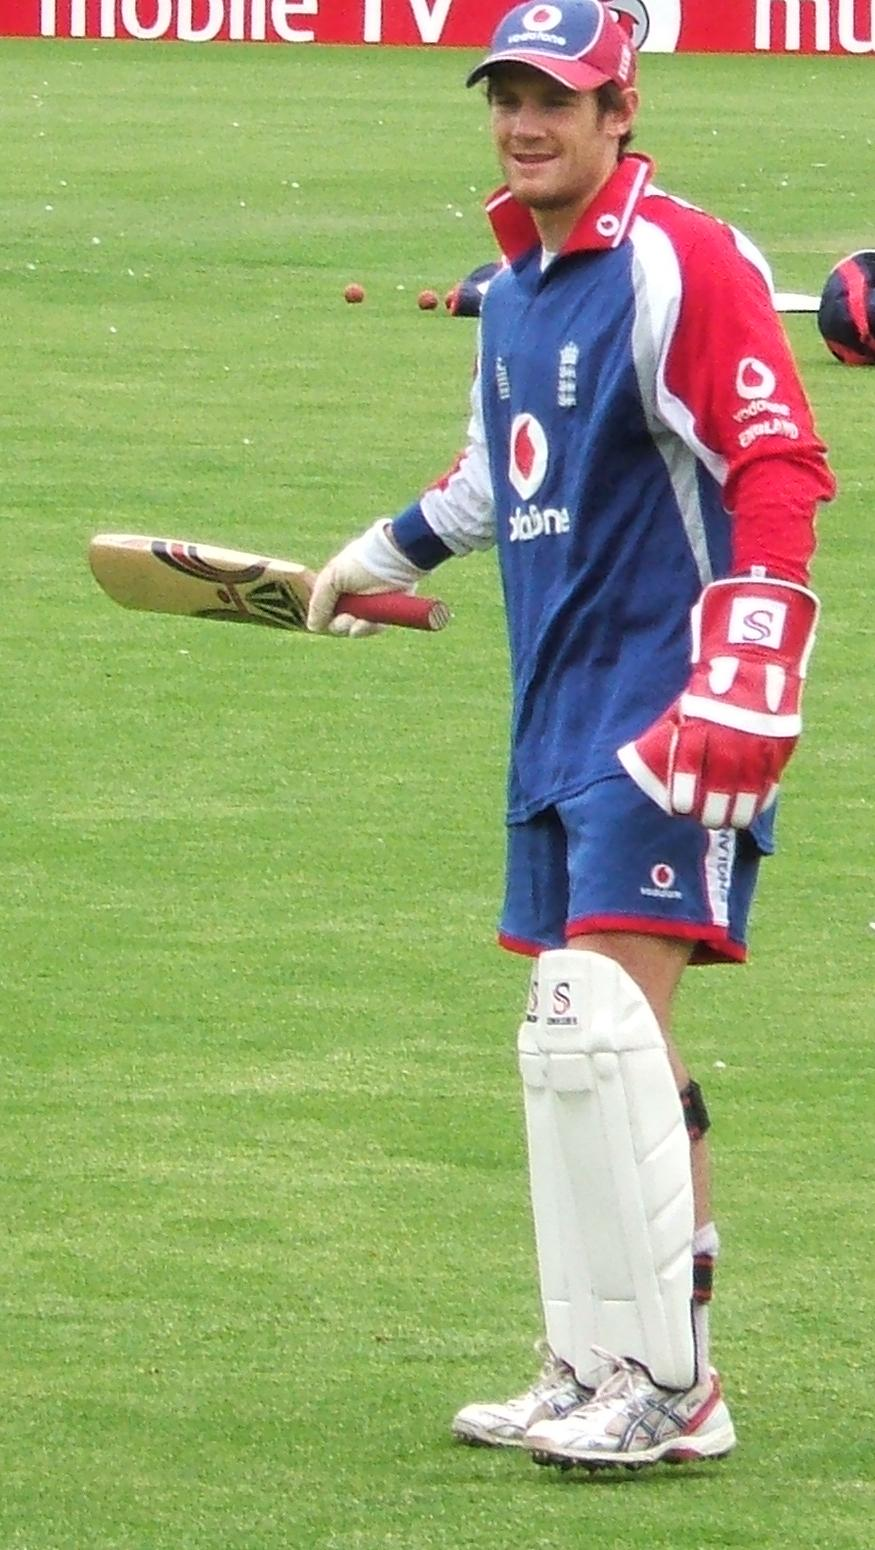 List Of Devon County Cricket Club List A Players Wikipedia